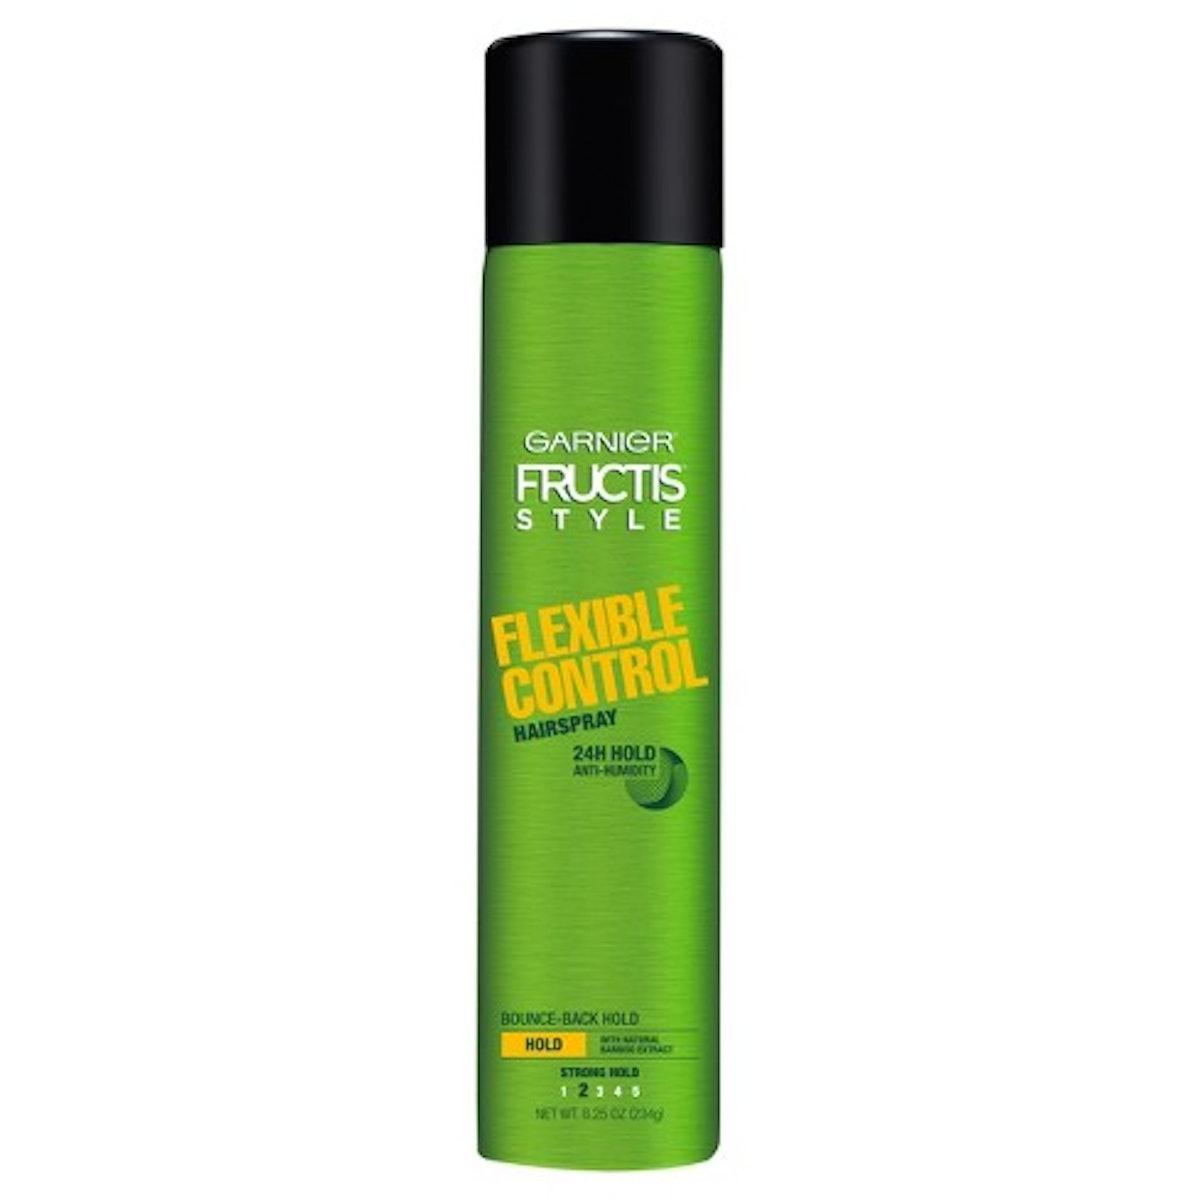 Garnier Fructis Style Flexible Hold Hairspray